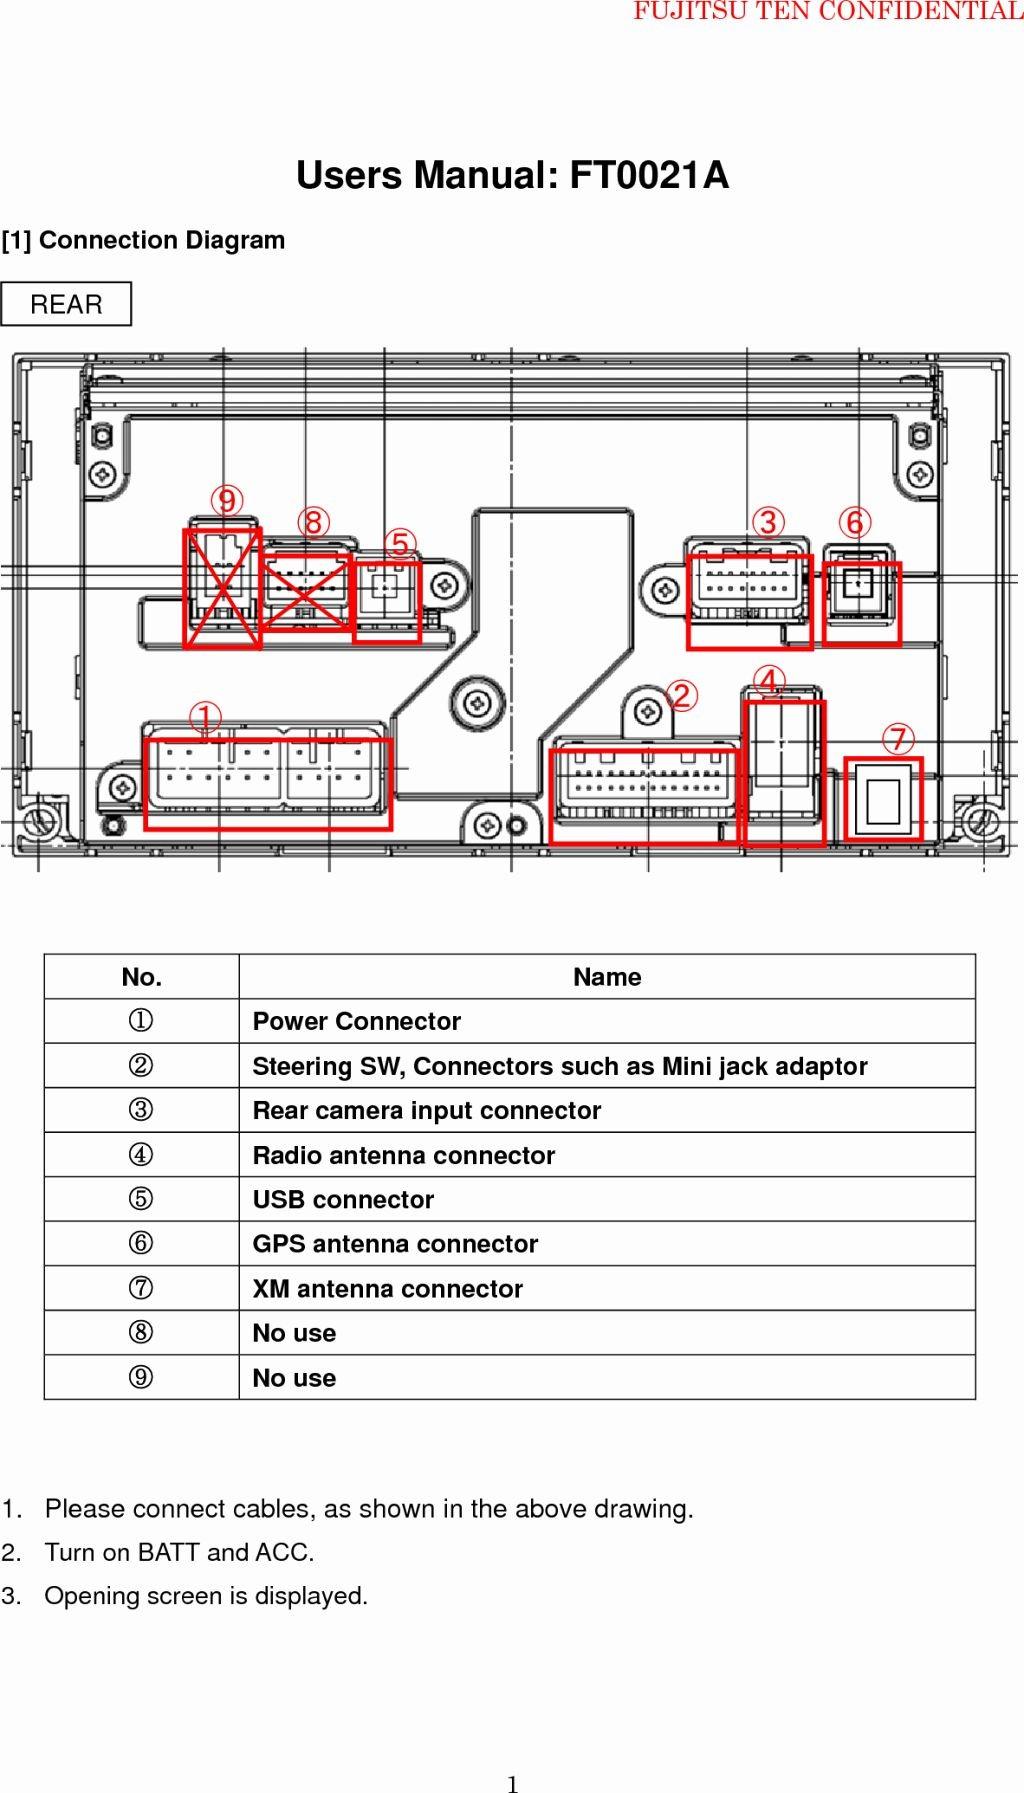 Toyota Fujitsu 14 Wiring Diagram Wiring Diagram Blog Toyota Fujitsu 14 Wiring Diagram